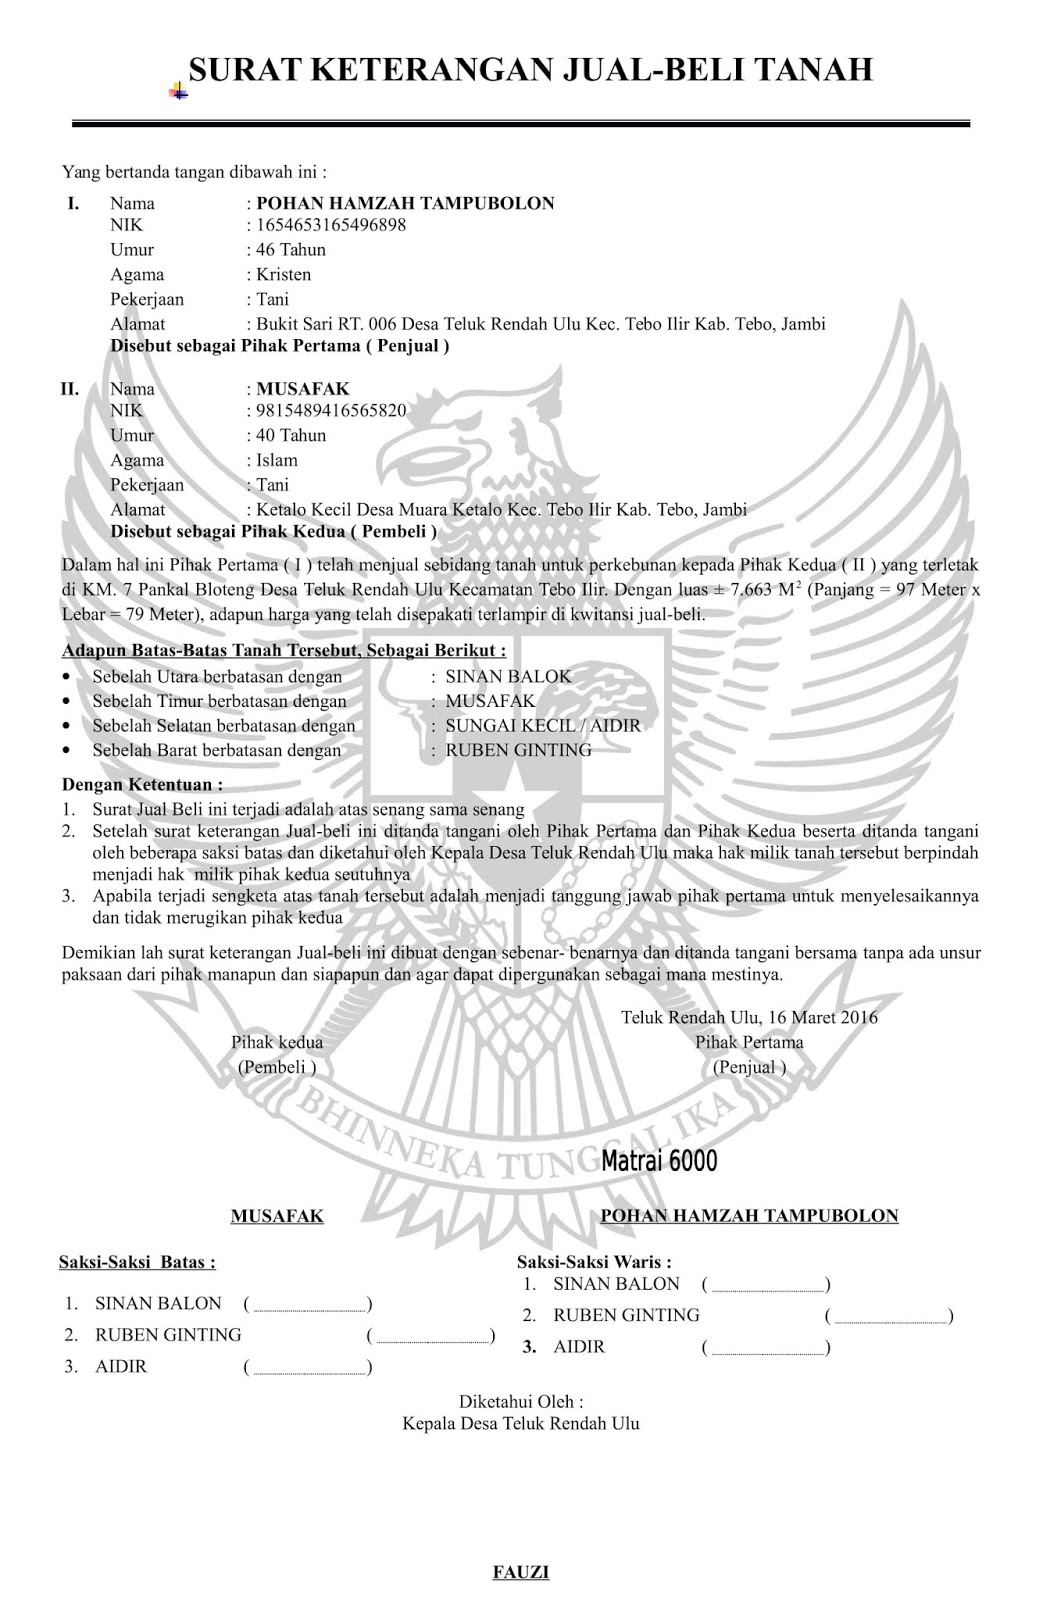 Contoh Surat Perjanjian Ganti Rugi Diatas Materai